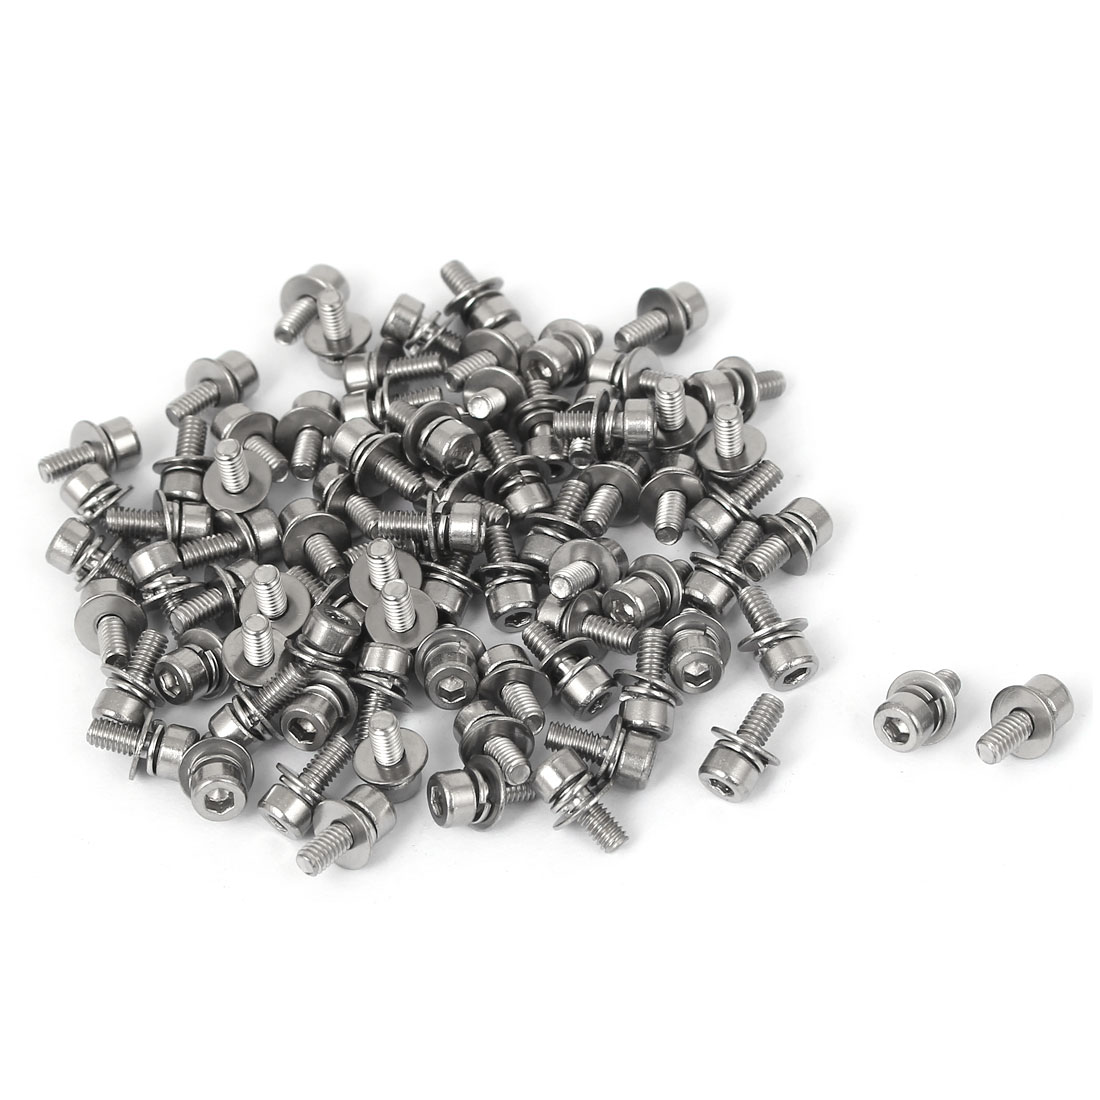 8mm Length M2.5 x 6mm Thread Hex Socket Head Cap Screw w Washer Silver Tone 80 Pcs